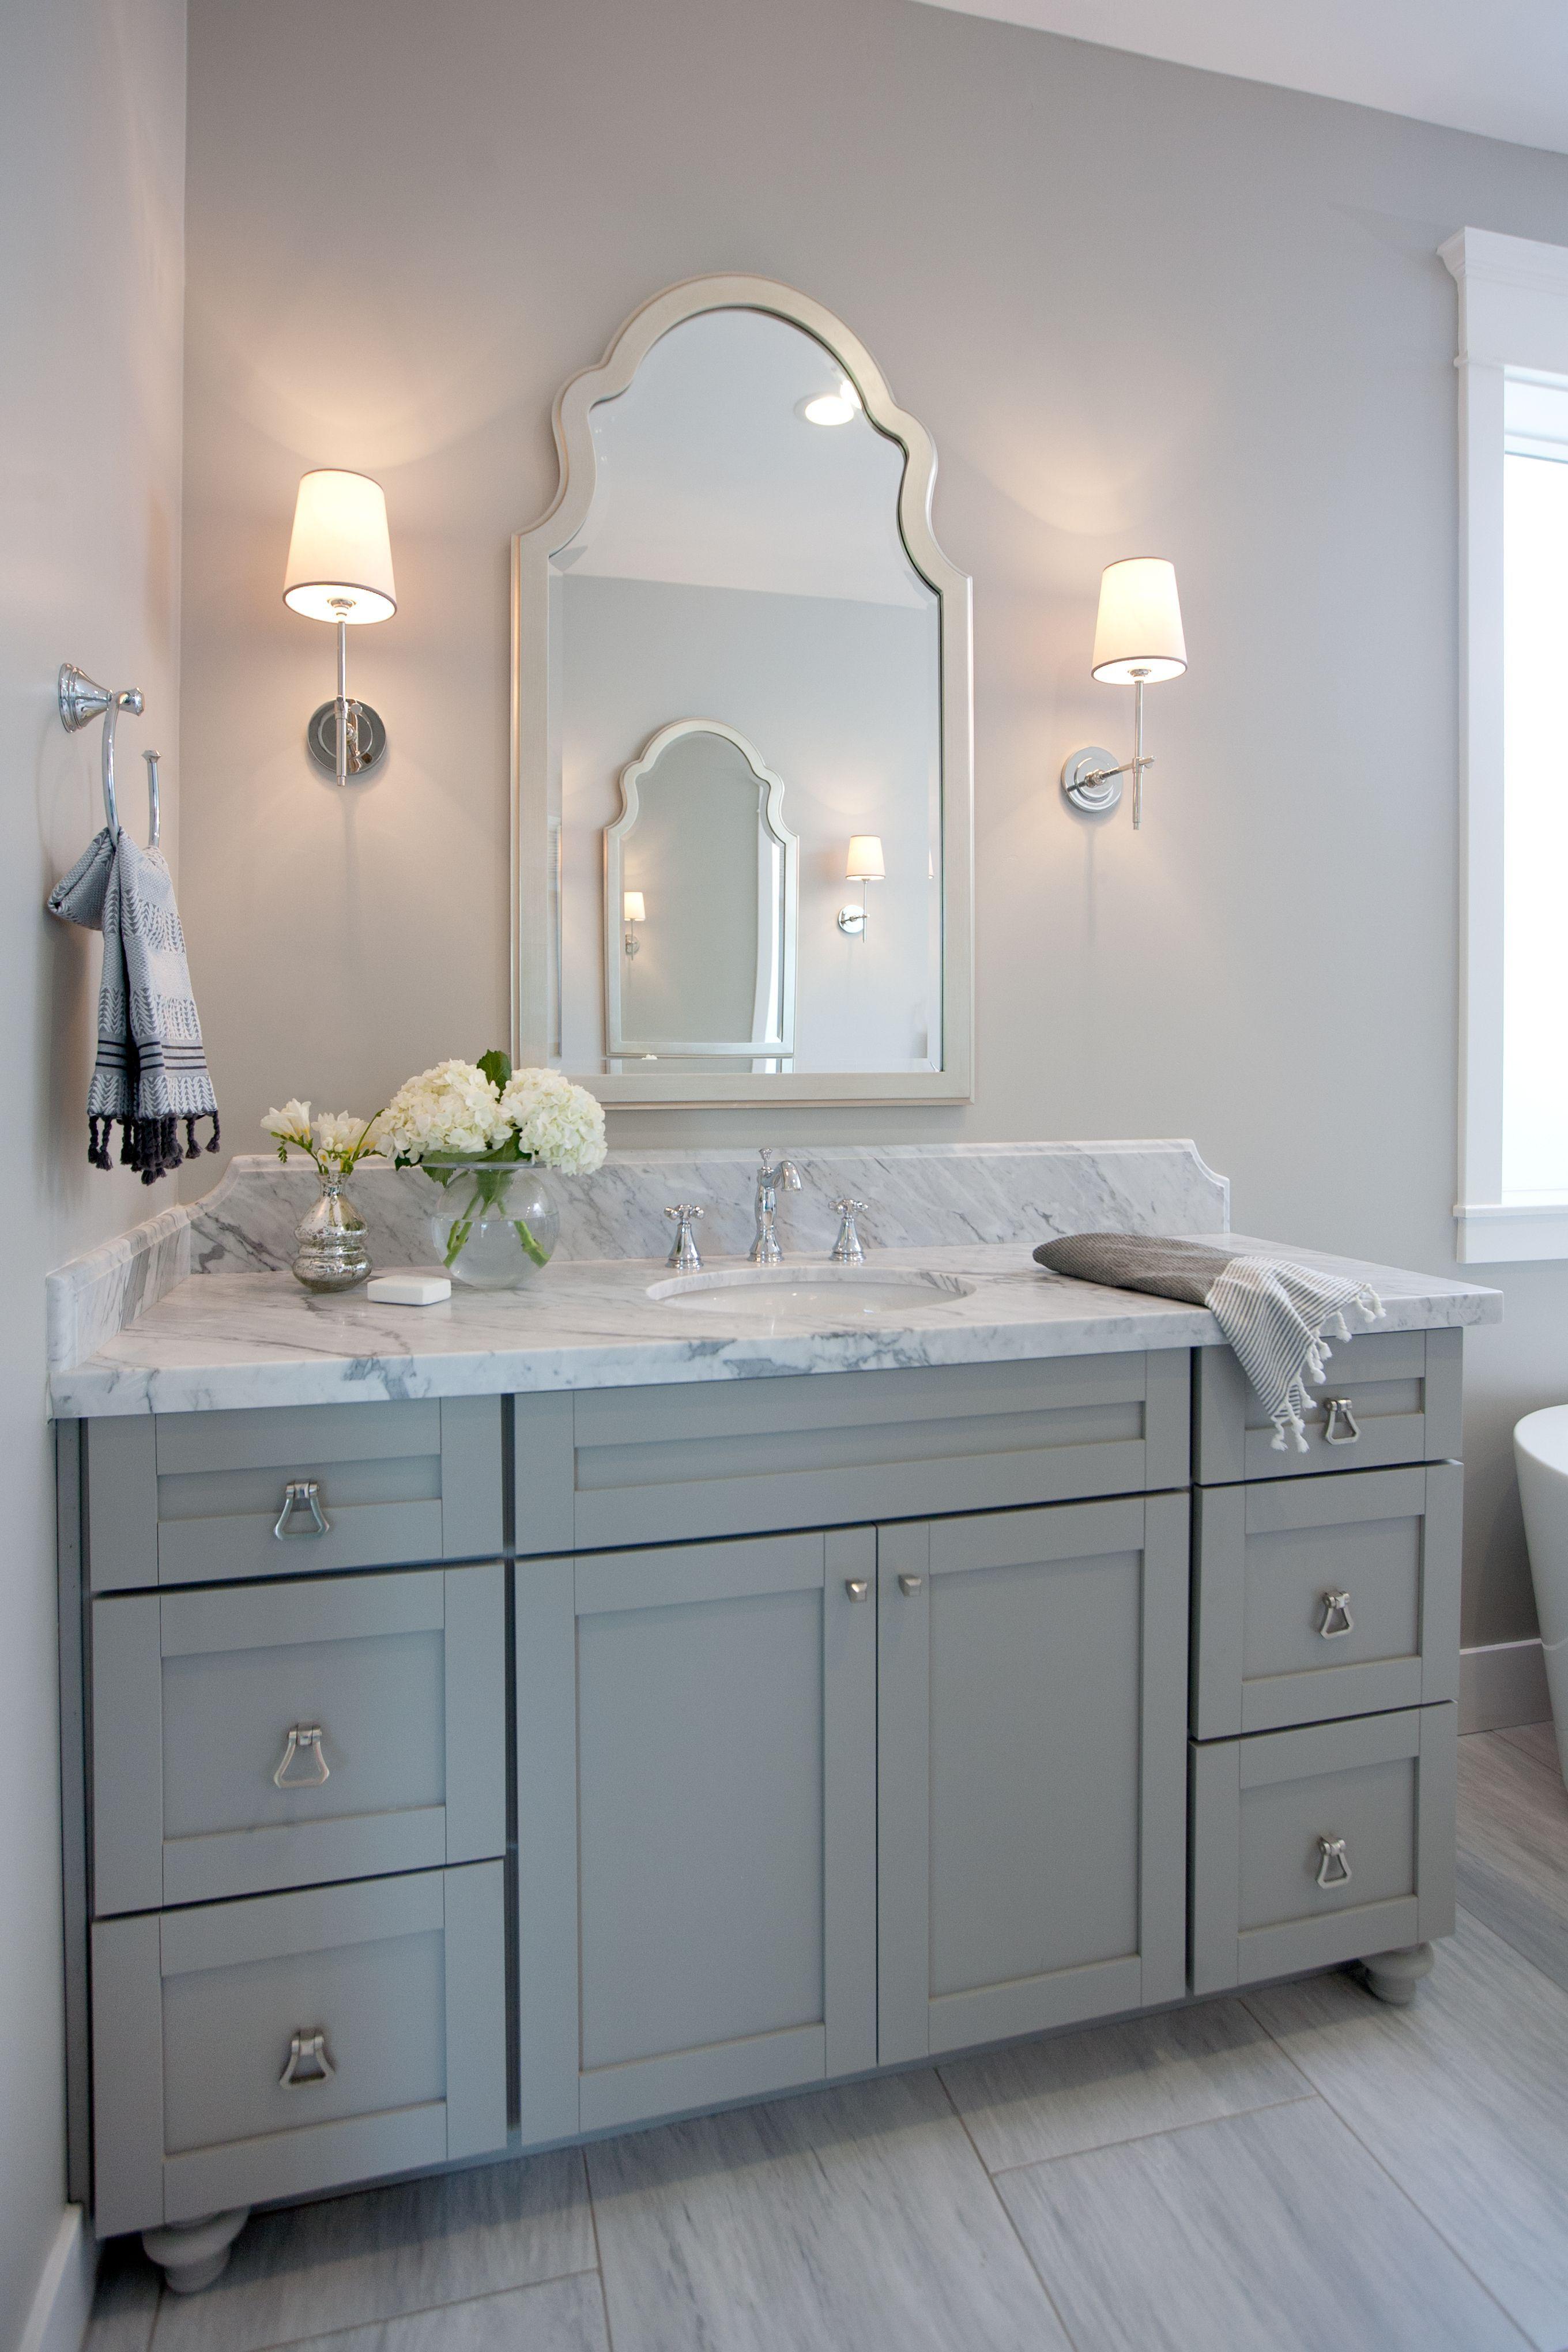 19 Excellent Grey Bathroom Ideas Gray Bathroom Decor Cheap